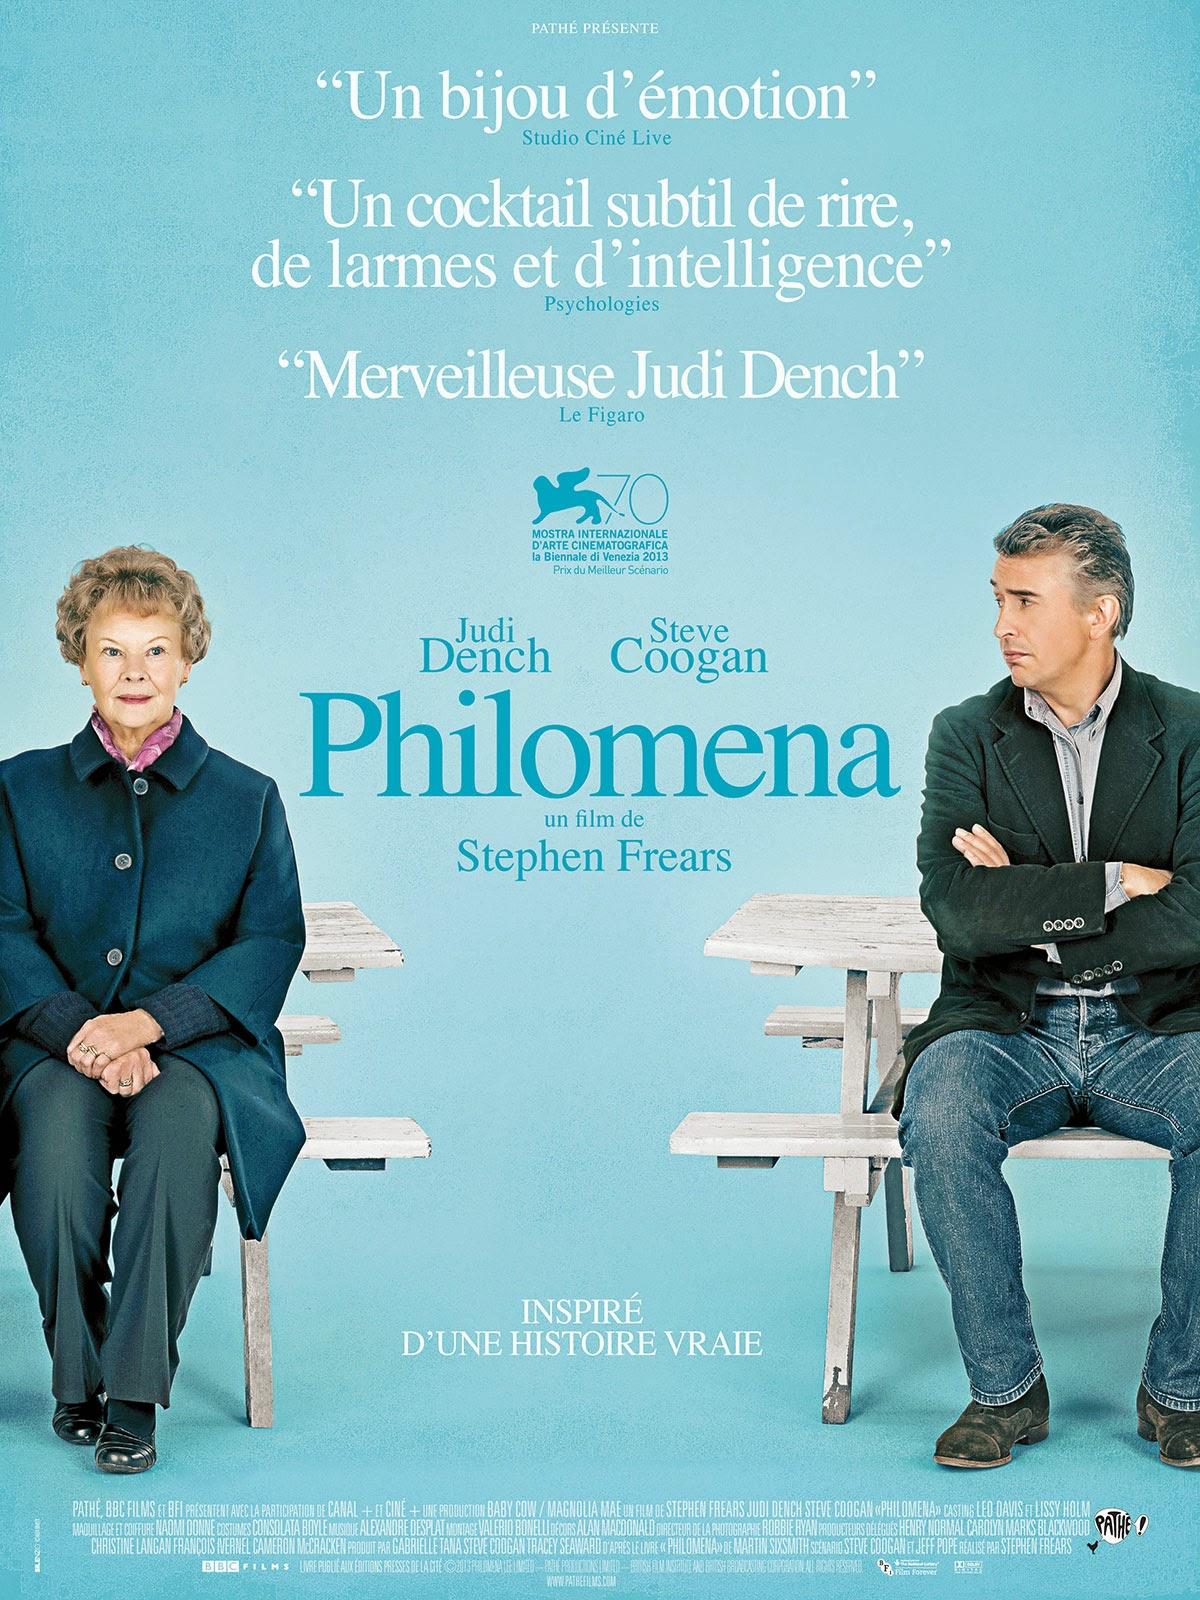 en 2013, Philomena, de Stephen Frears